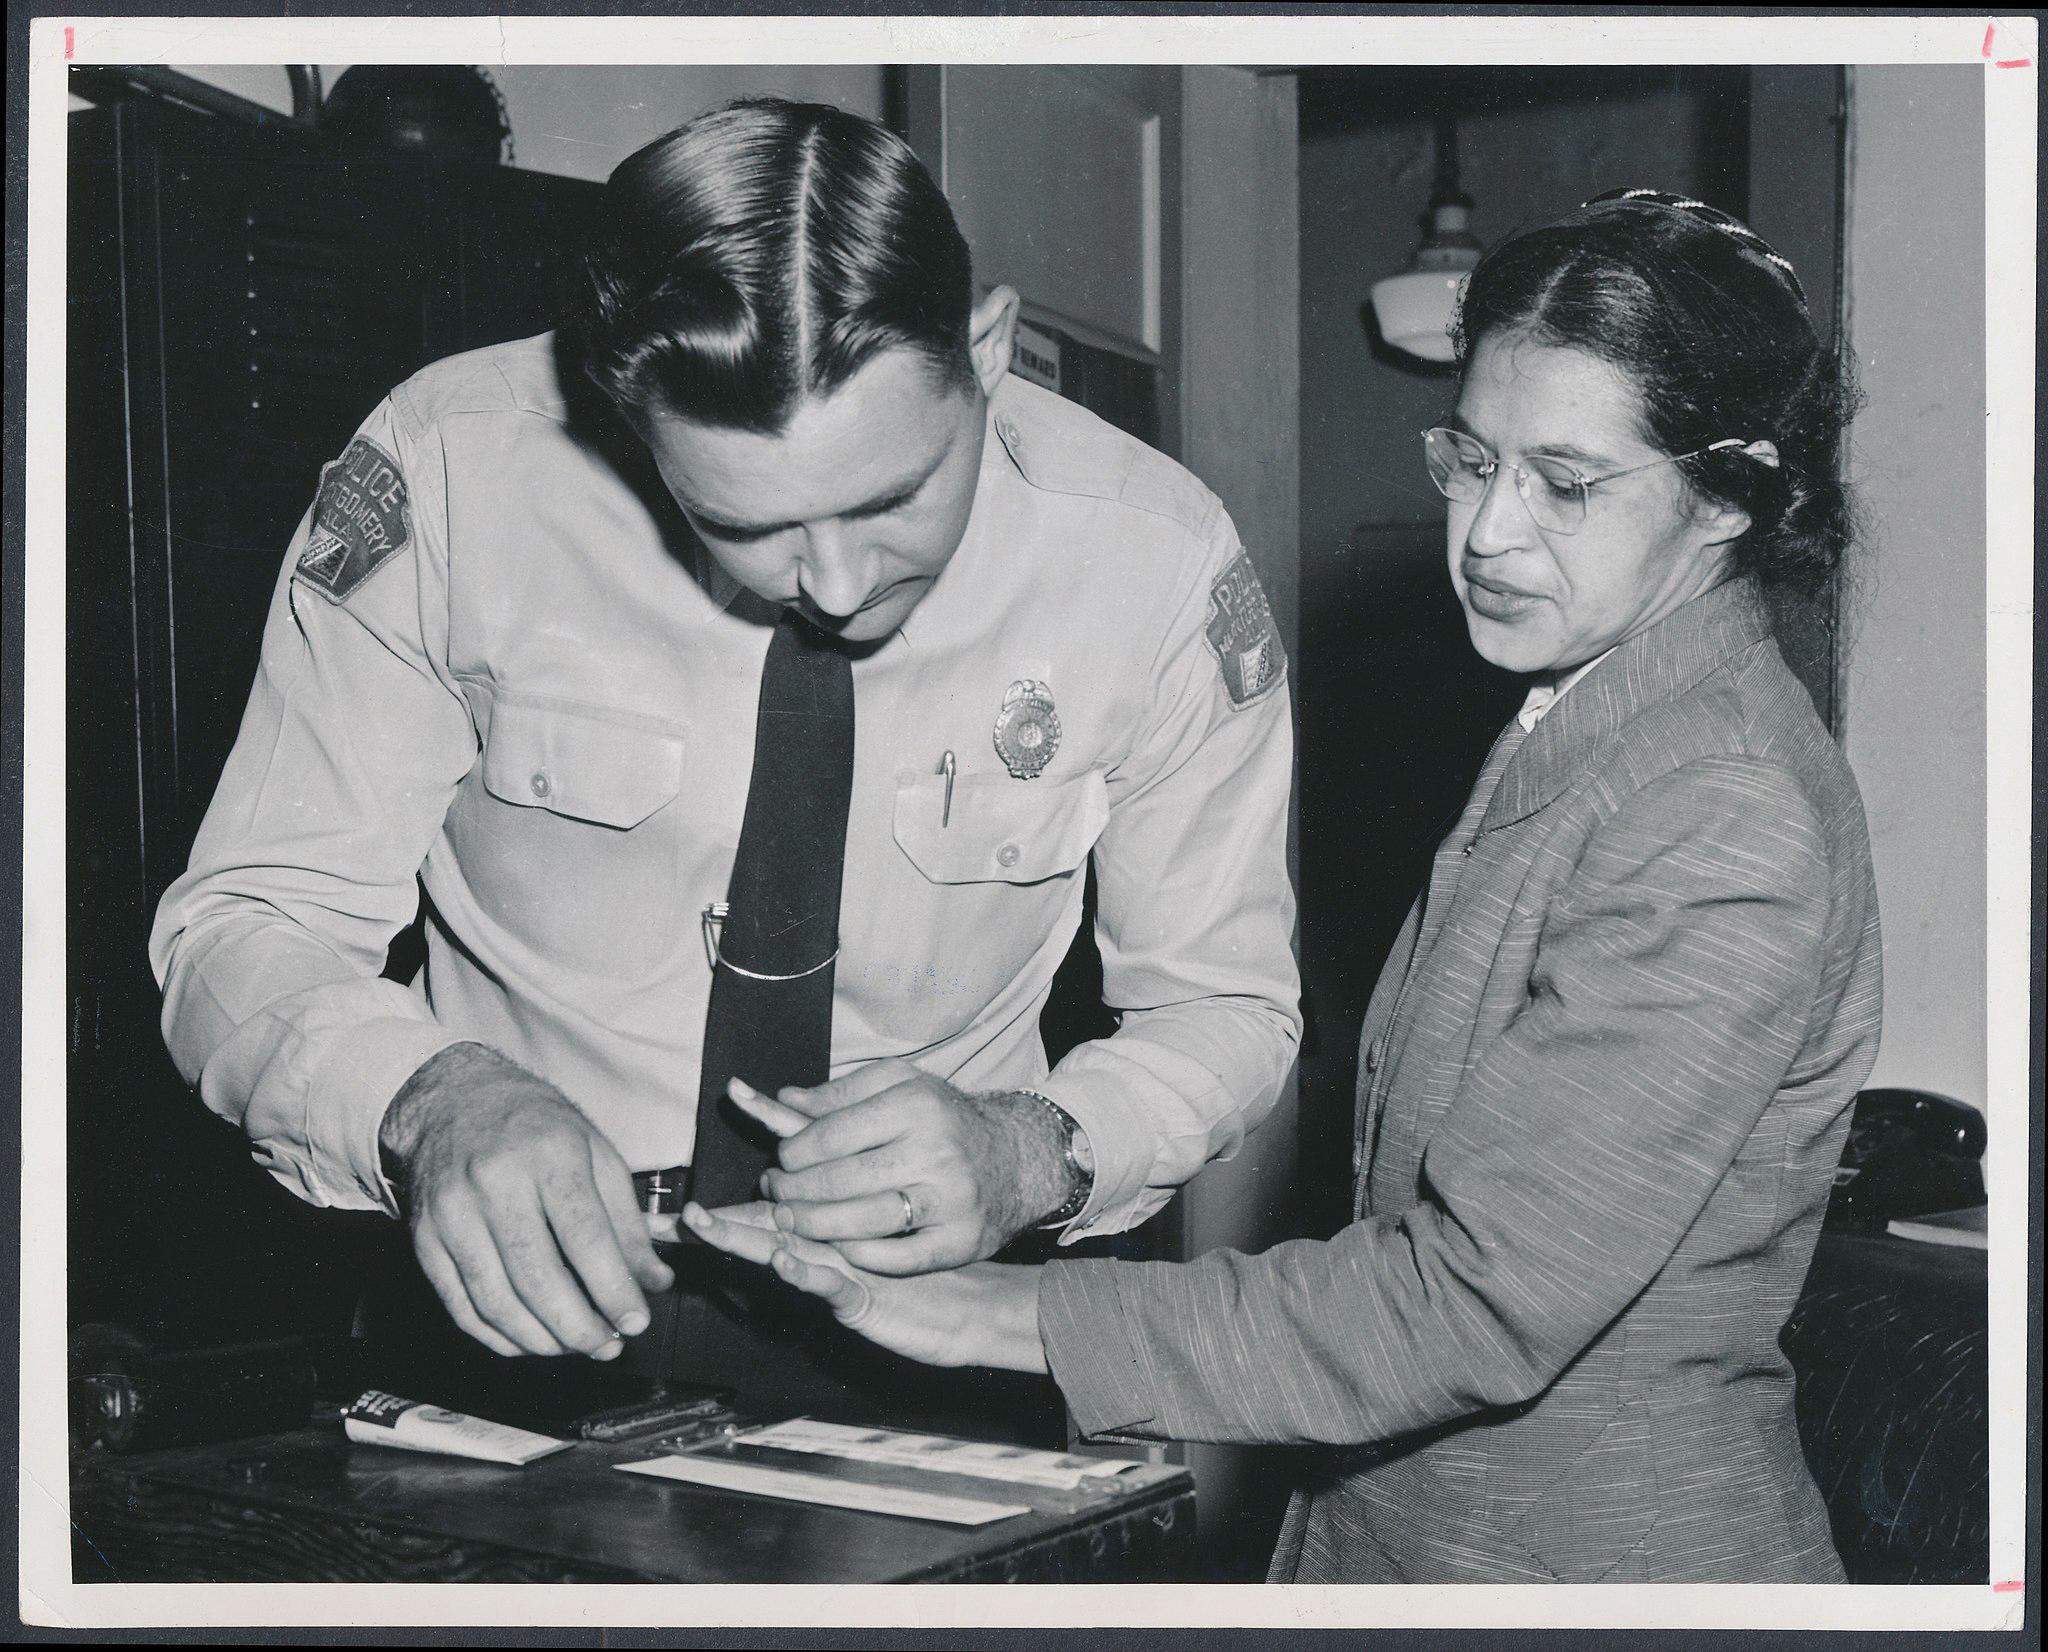 Rosa Parks being Fingerprinted in a police station.